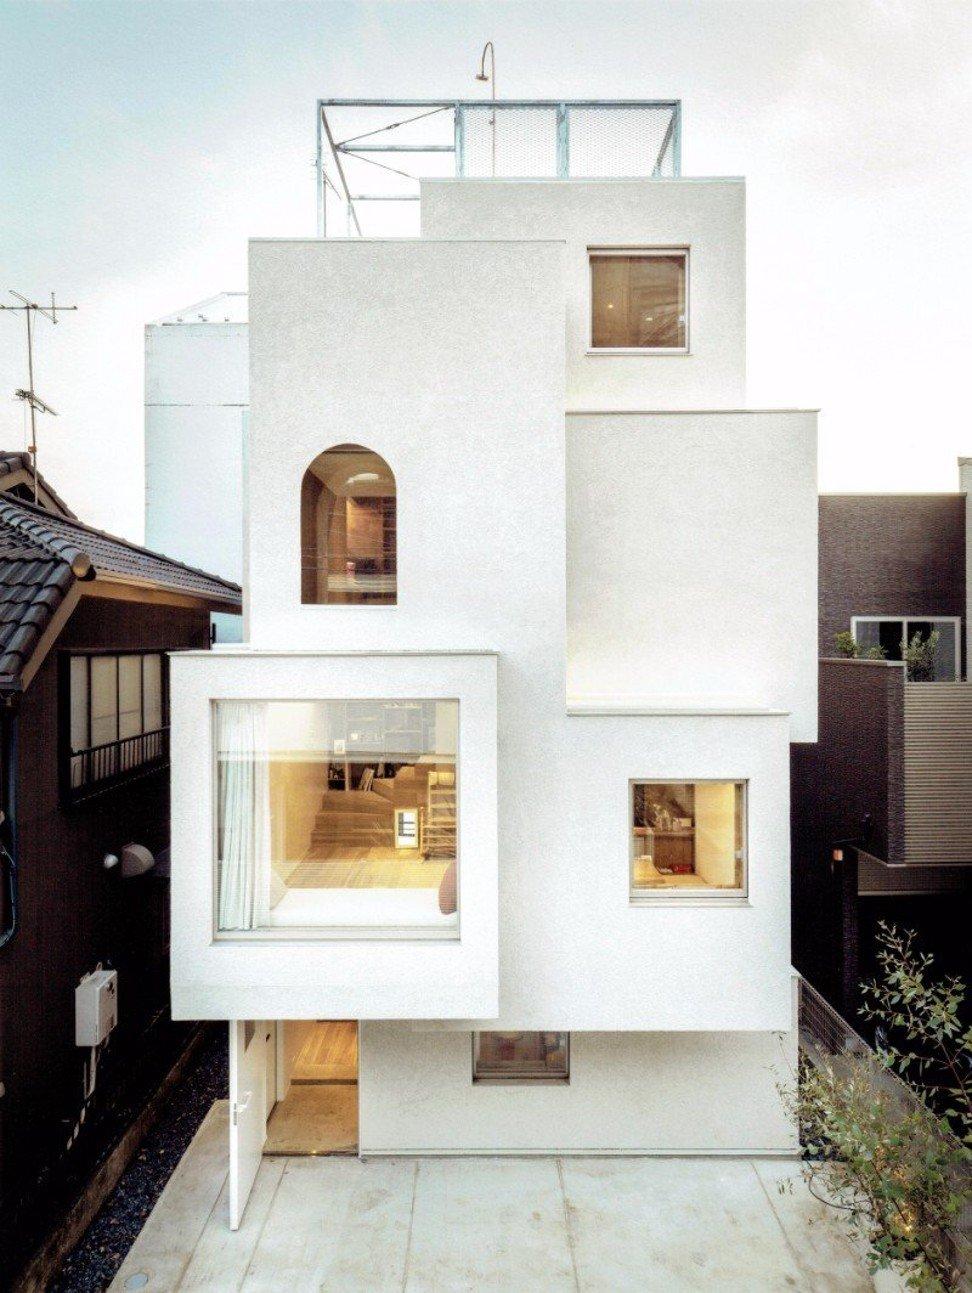 11 most beautiful new homes around the world | Style Magazine ...